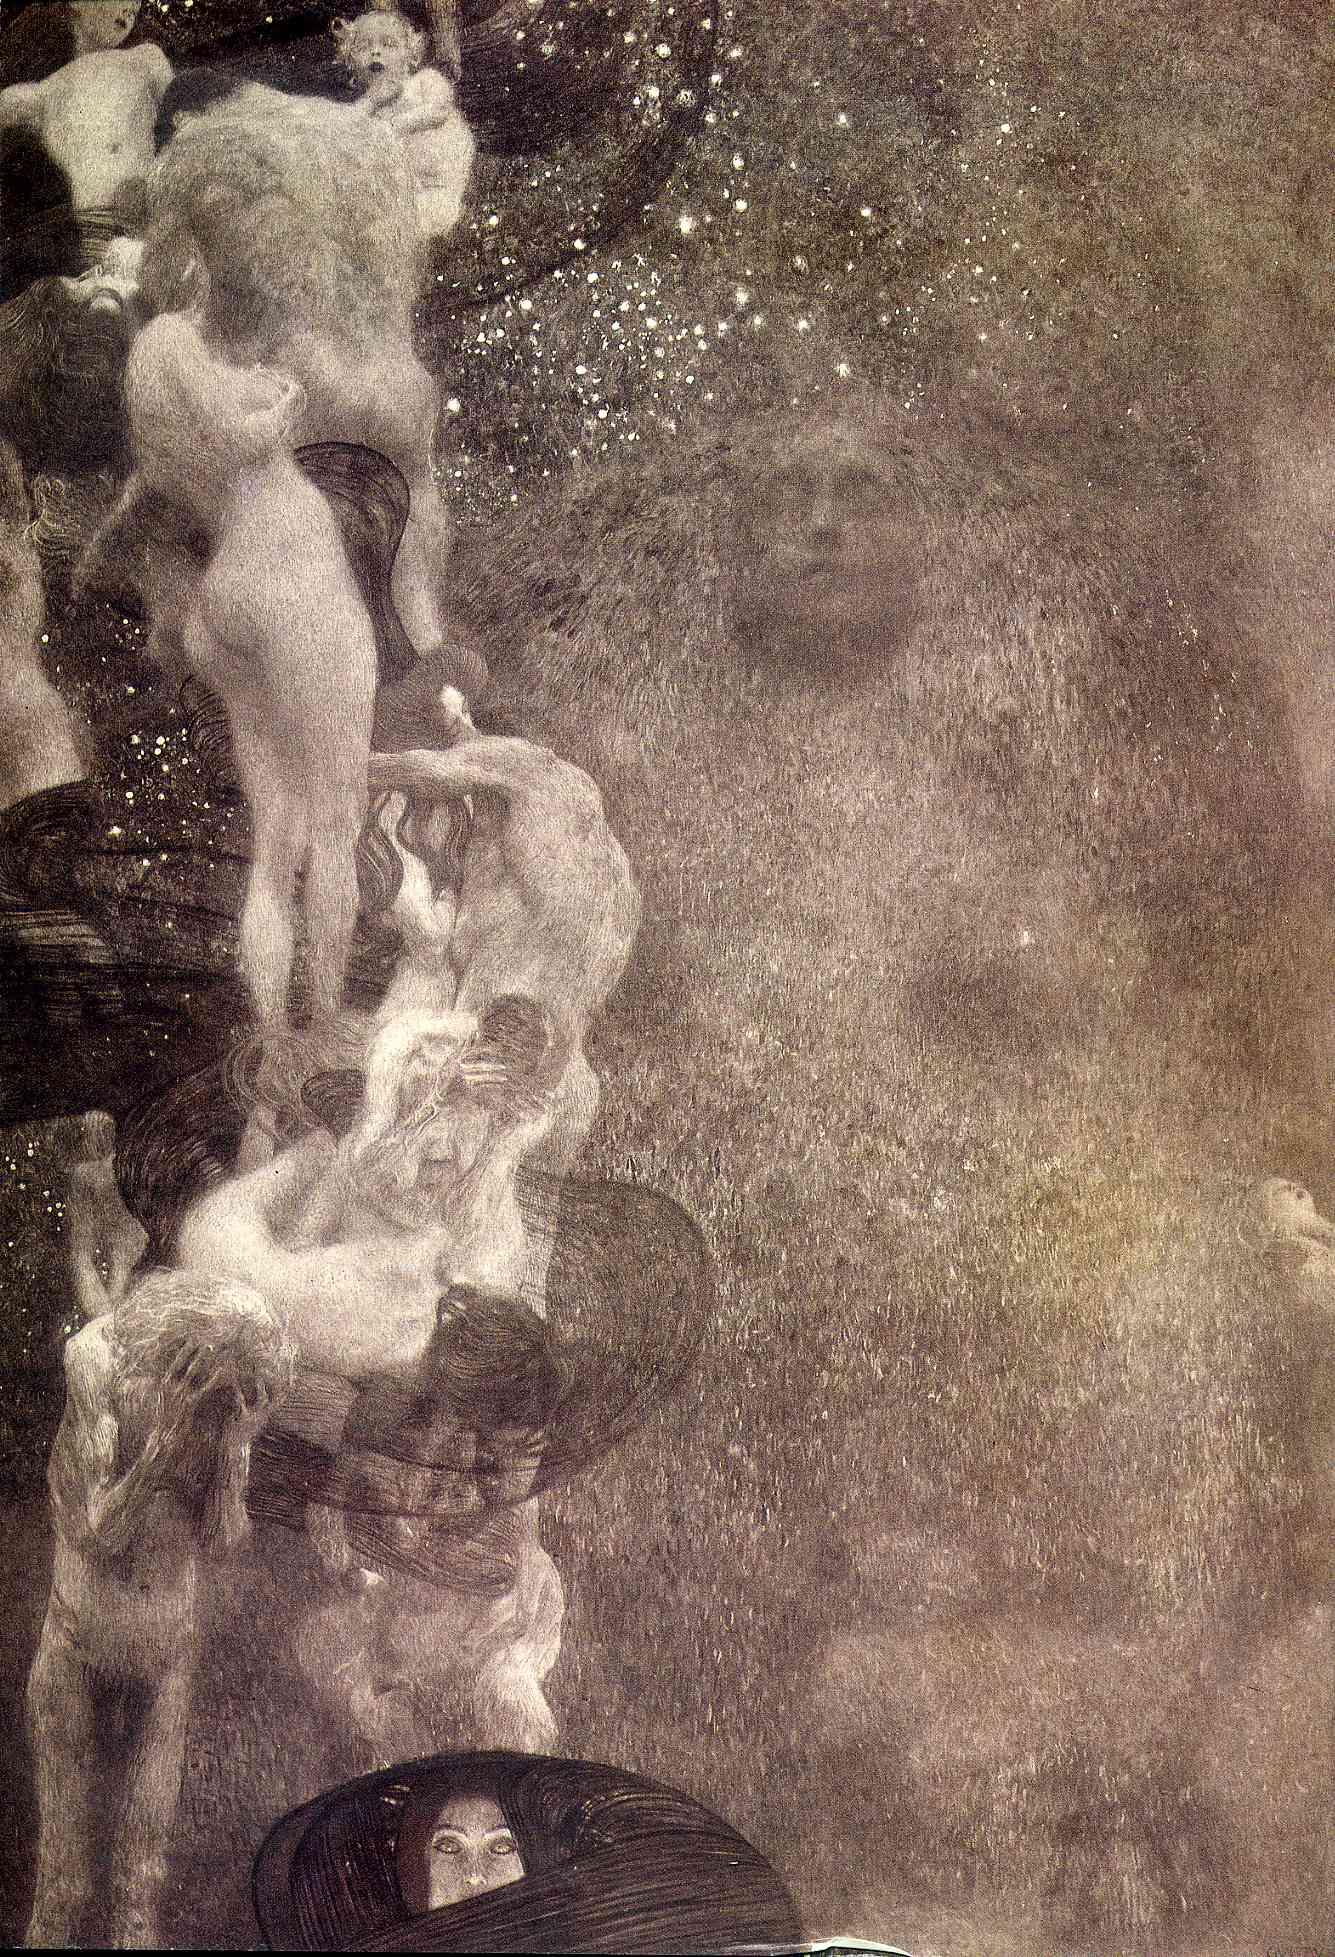 Klimt University of Vienna Ceiling Paintings - Wikipedia